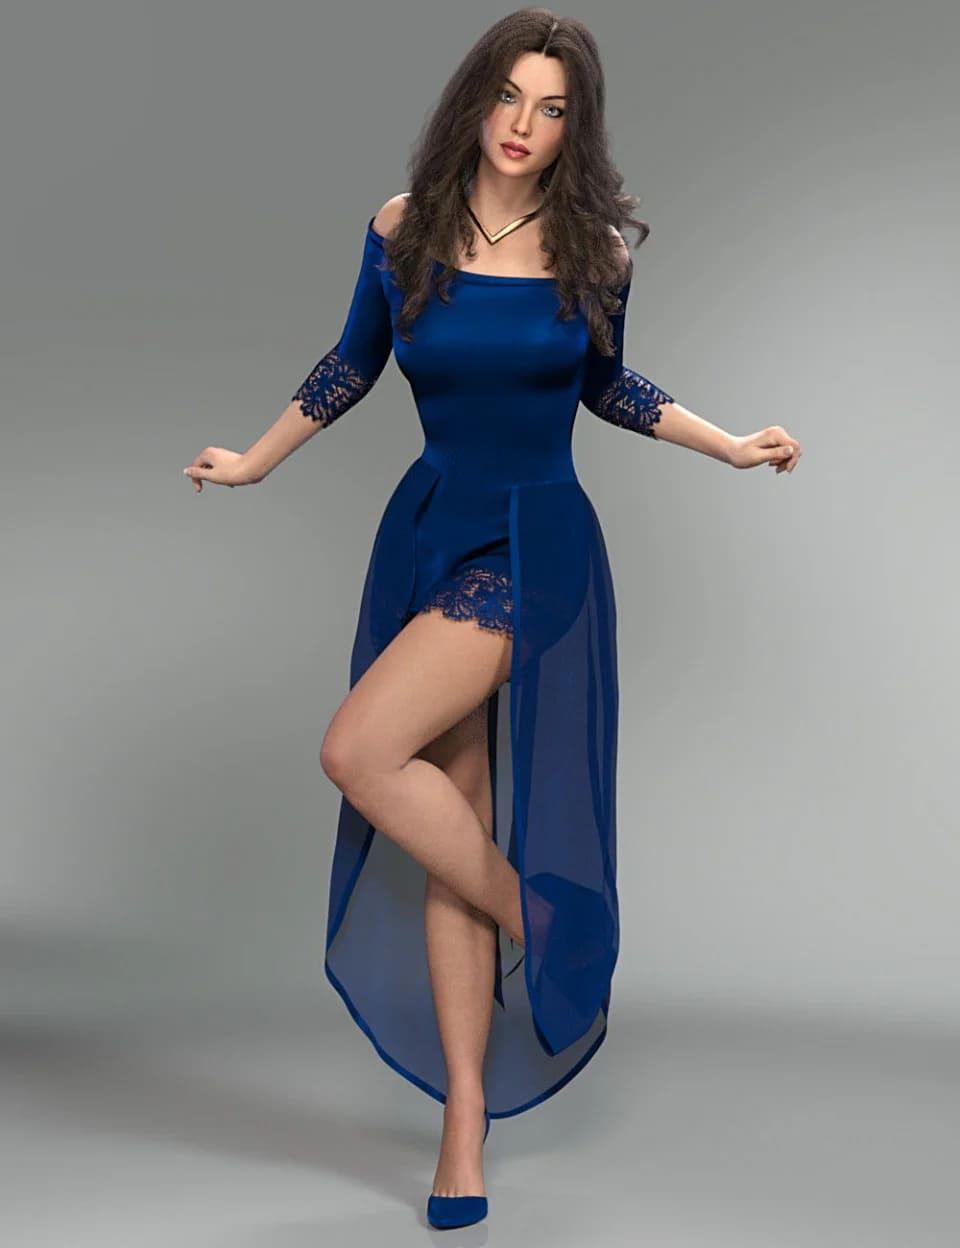 dForce Aimee Lynn Outfit for Genesis 8 Female(s)_DAZ3D下载站